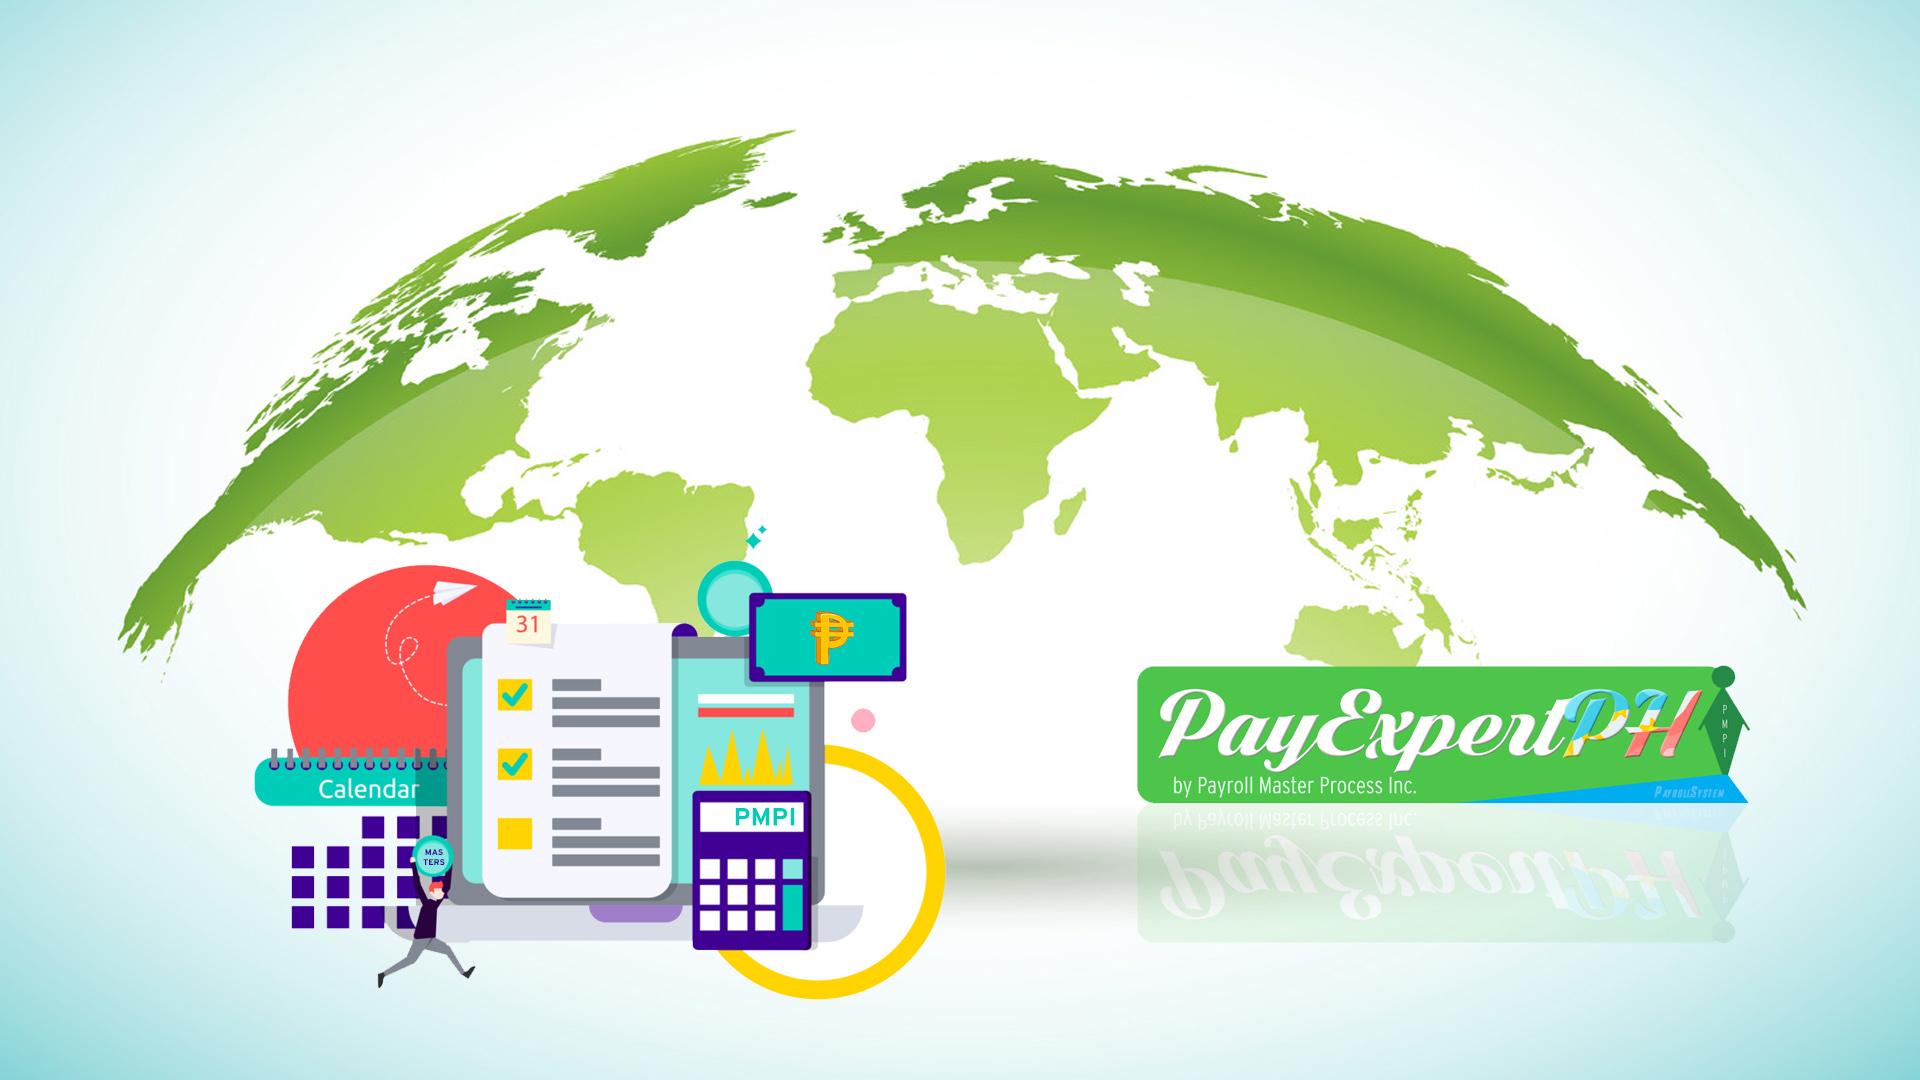 PayMaster Payroll System